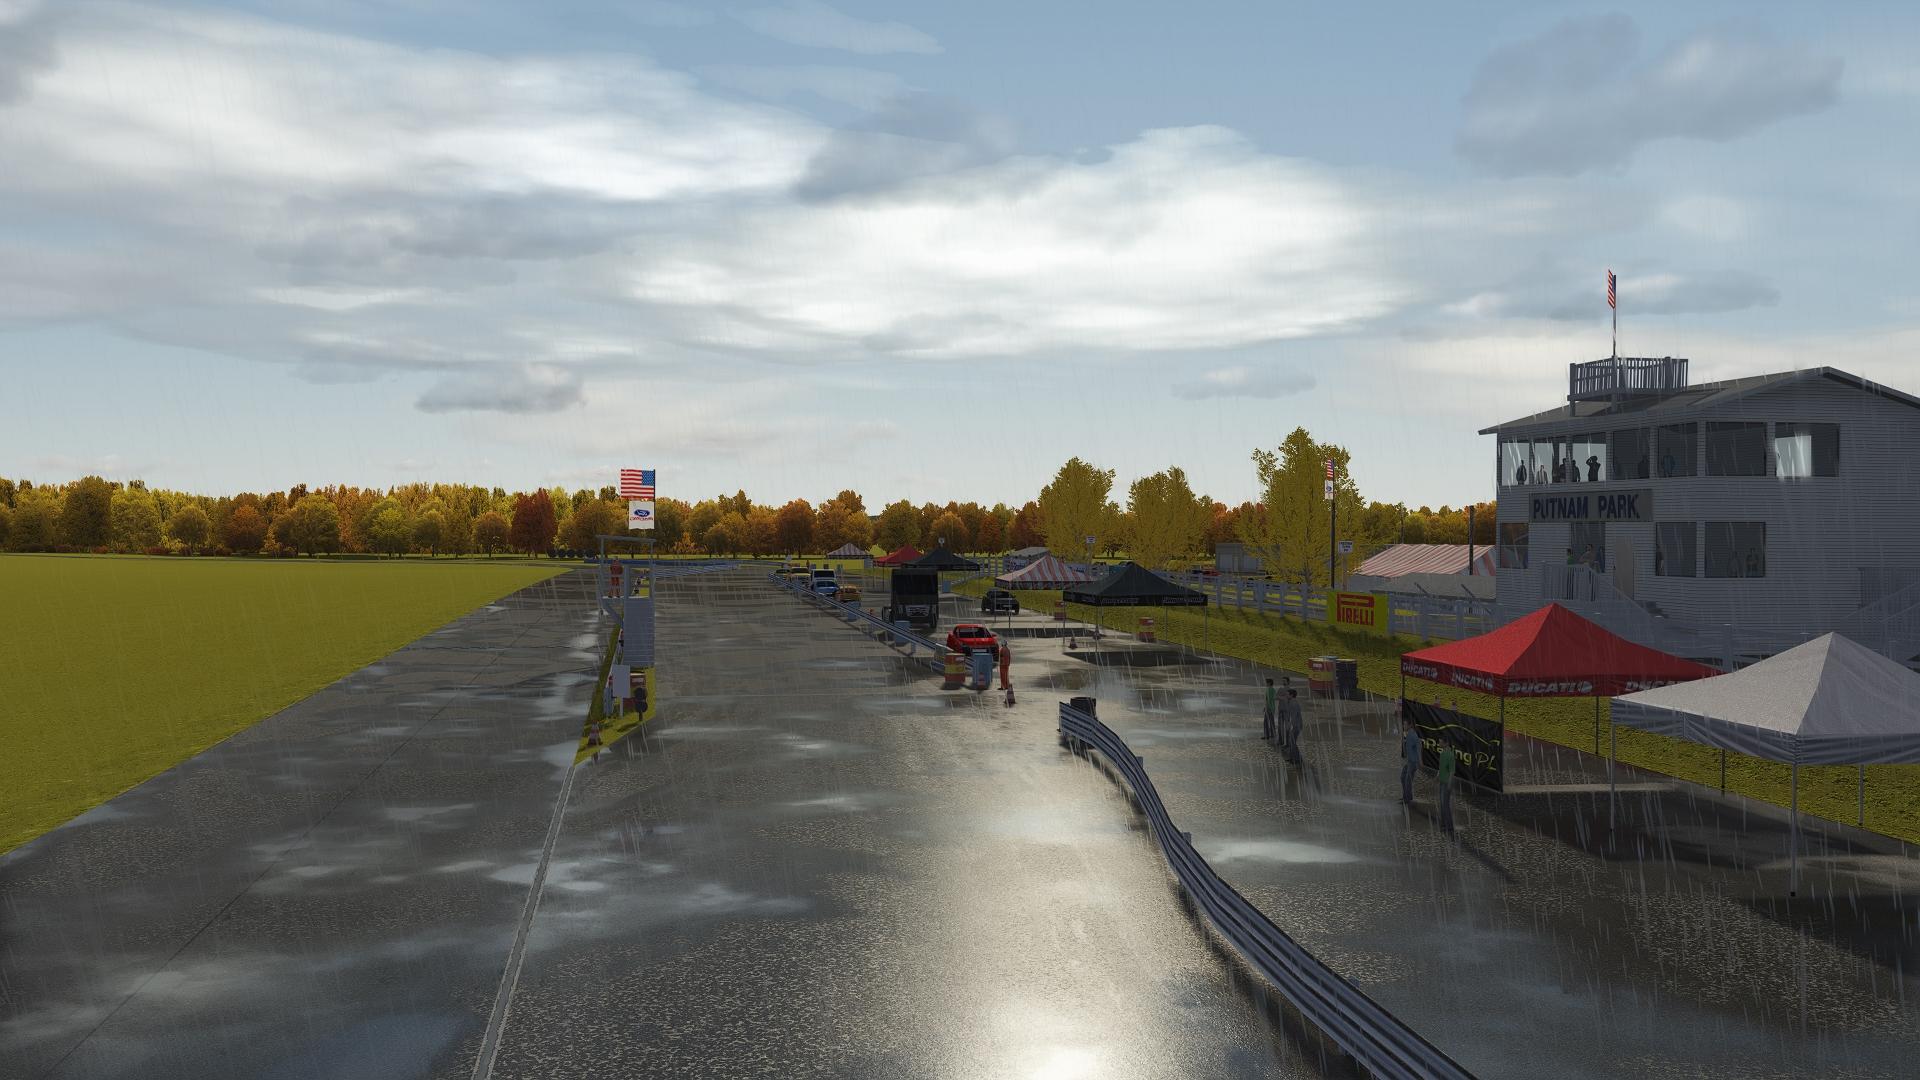 Screenshot_abarth500_s1_putnam_park_8-4-121-23-18-24.jpg